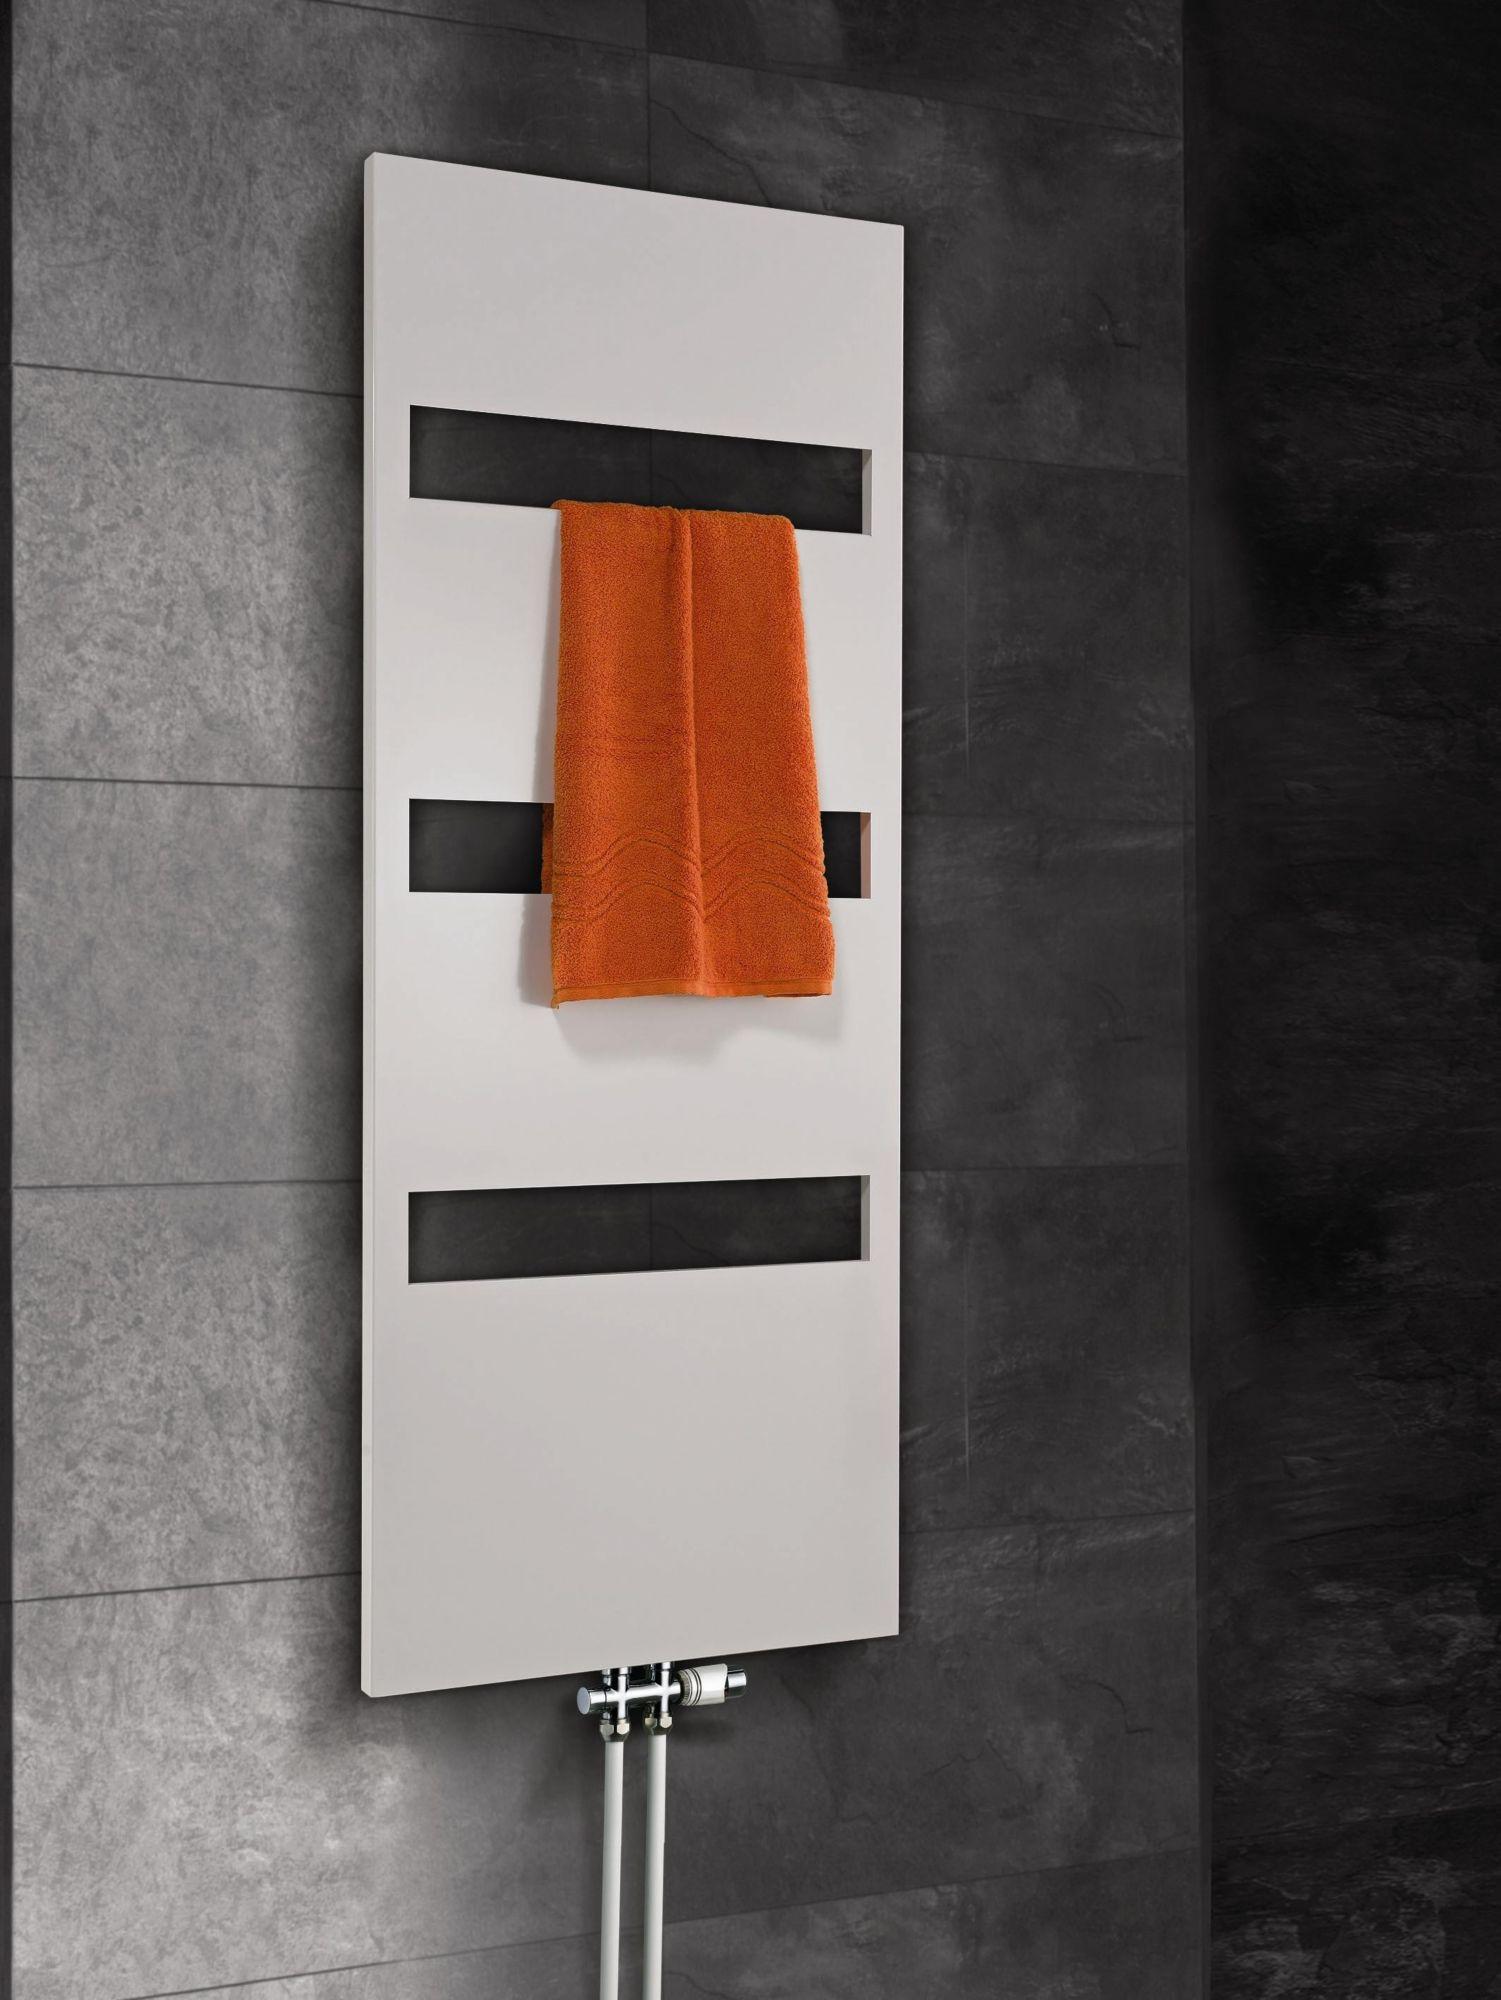 designheizk rper turin schwab versand schulte. Black Bedroom Furniture Sets. Home Design Ideas